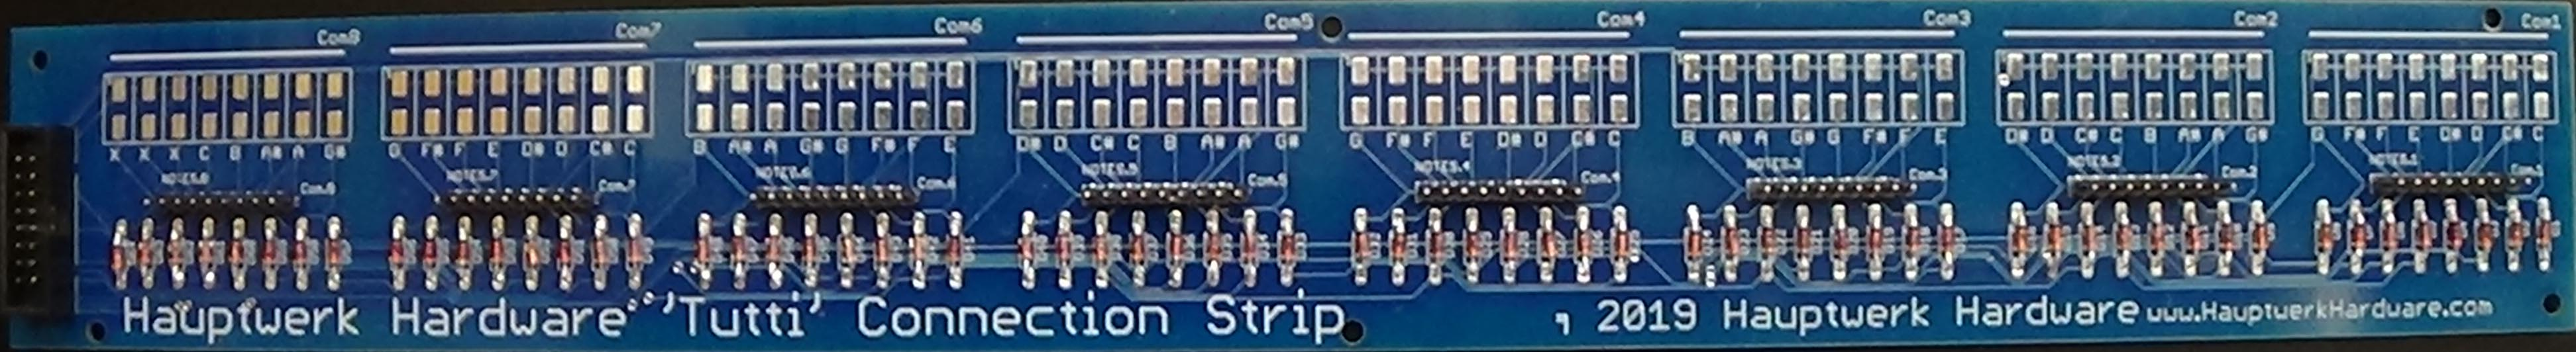 Tutti Connection Strip